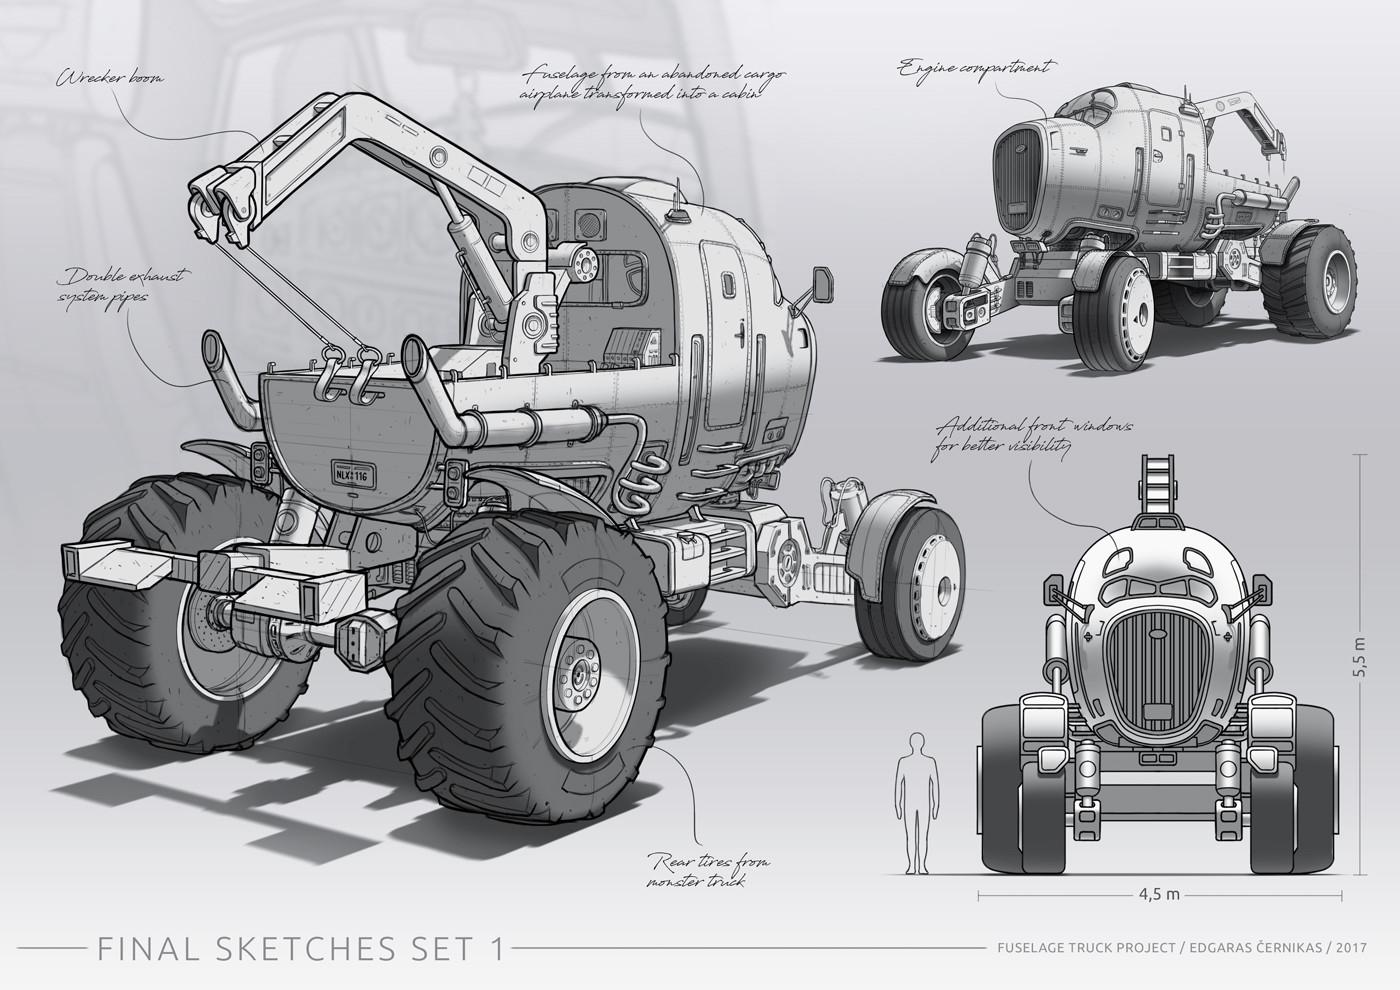 Jonas prunskus edgaras cernikas fuselage truck final sketches set 1 1400x990